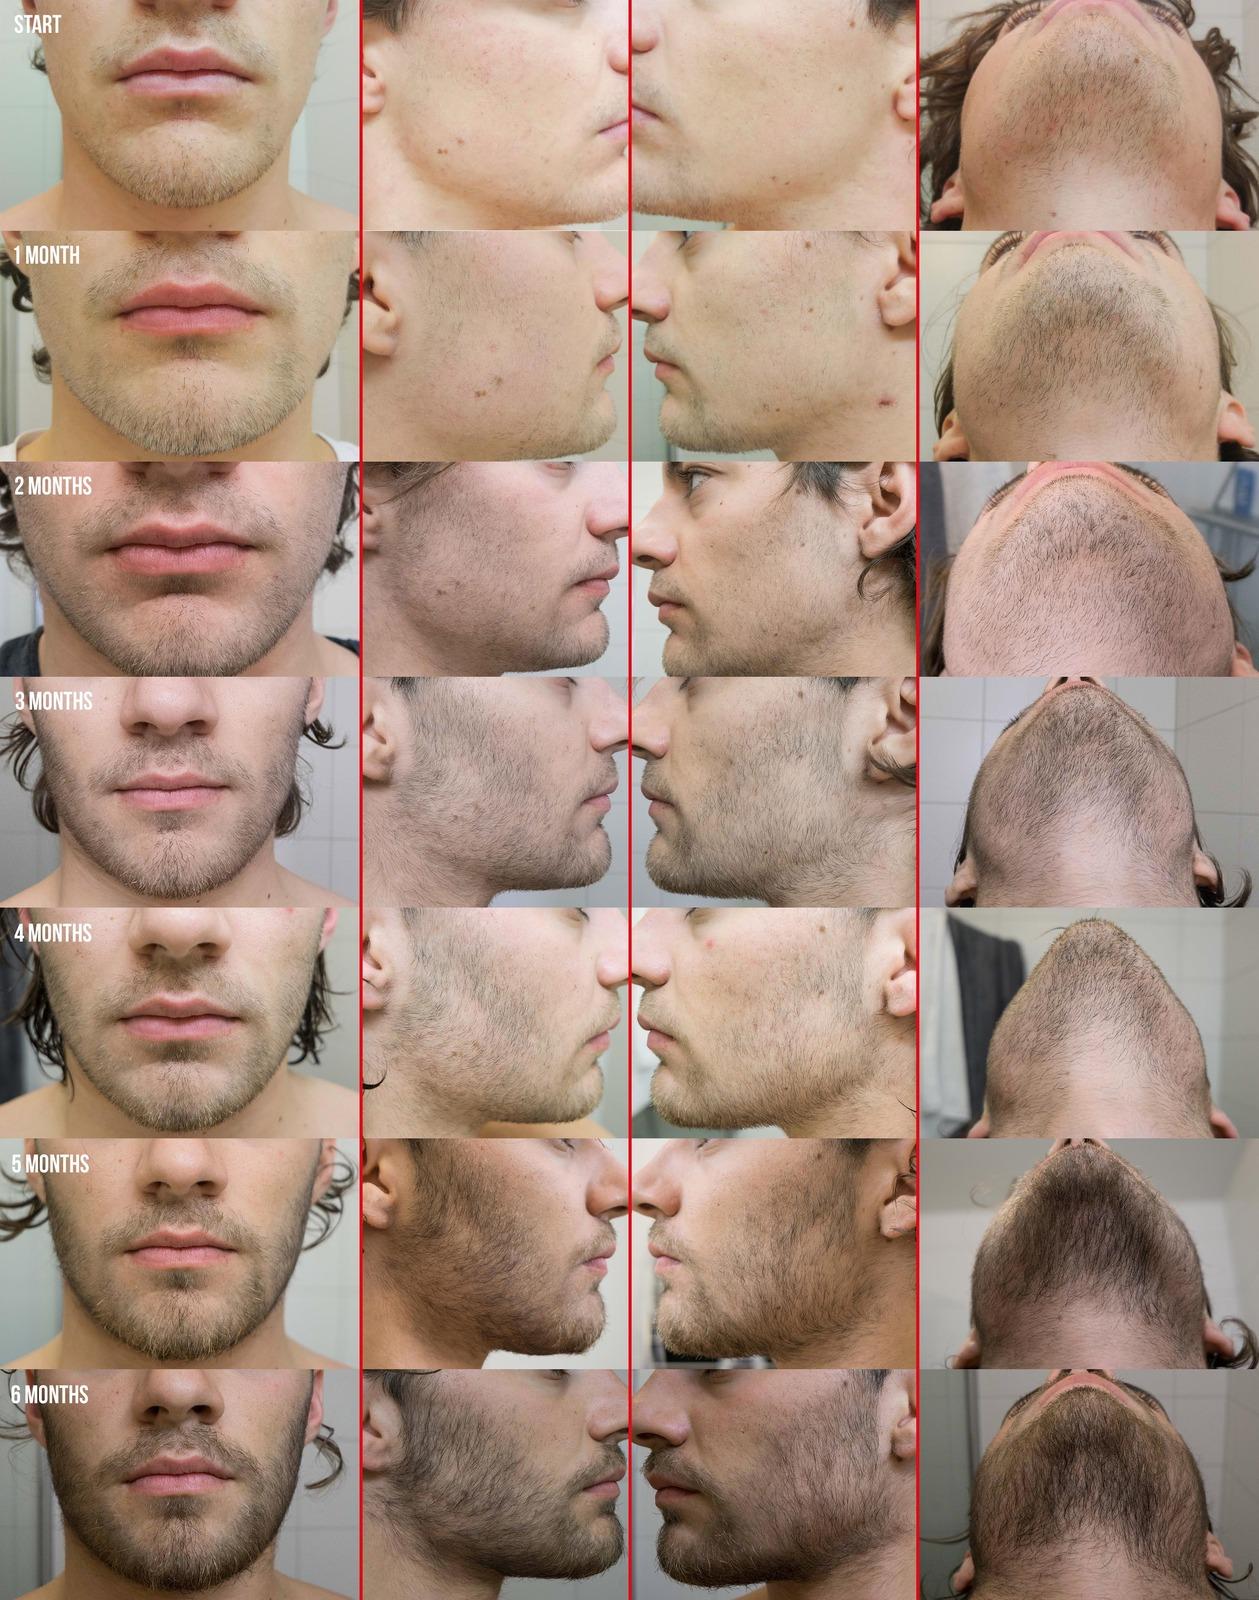 Anyone ever tried Minoxidil for beard growth? | NeoGAF